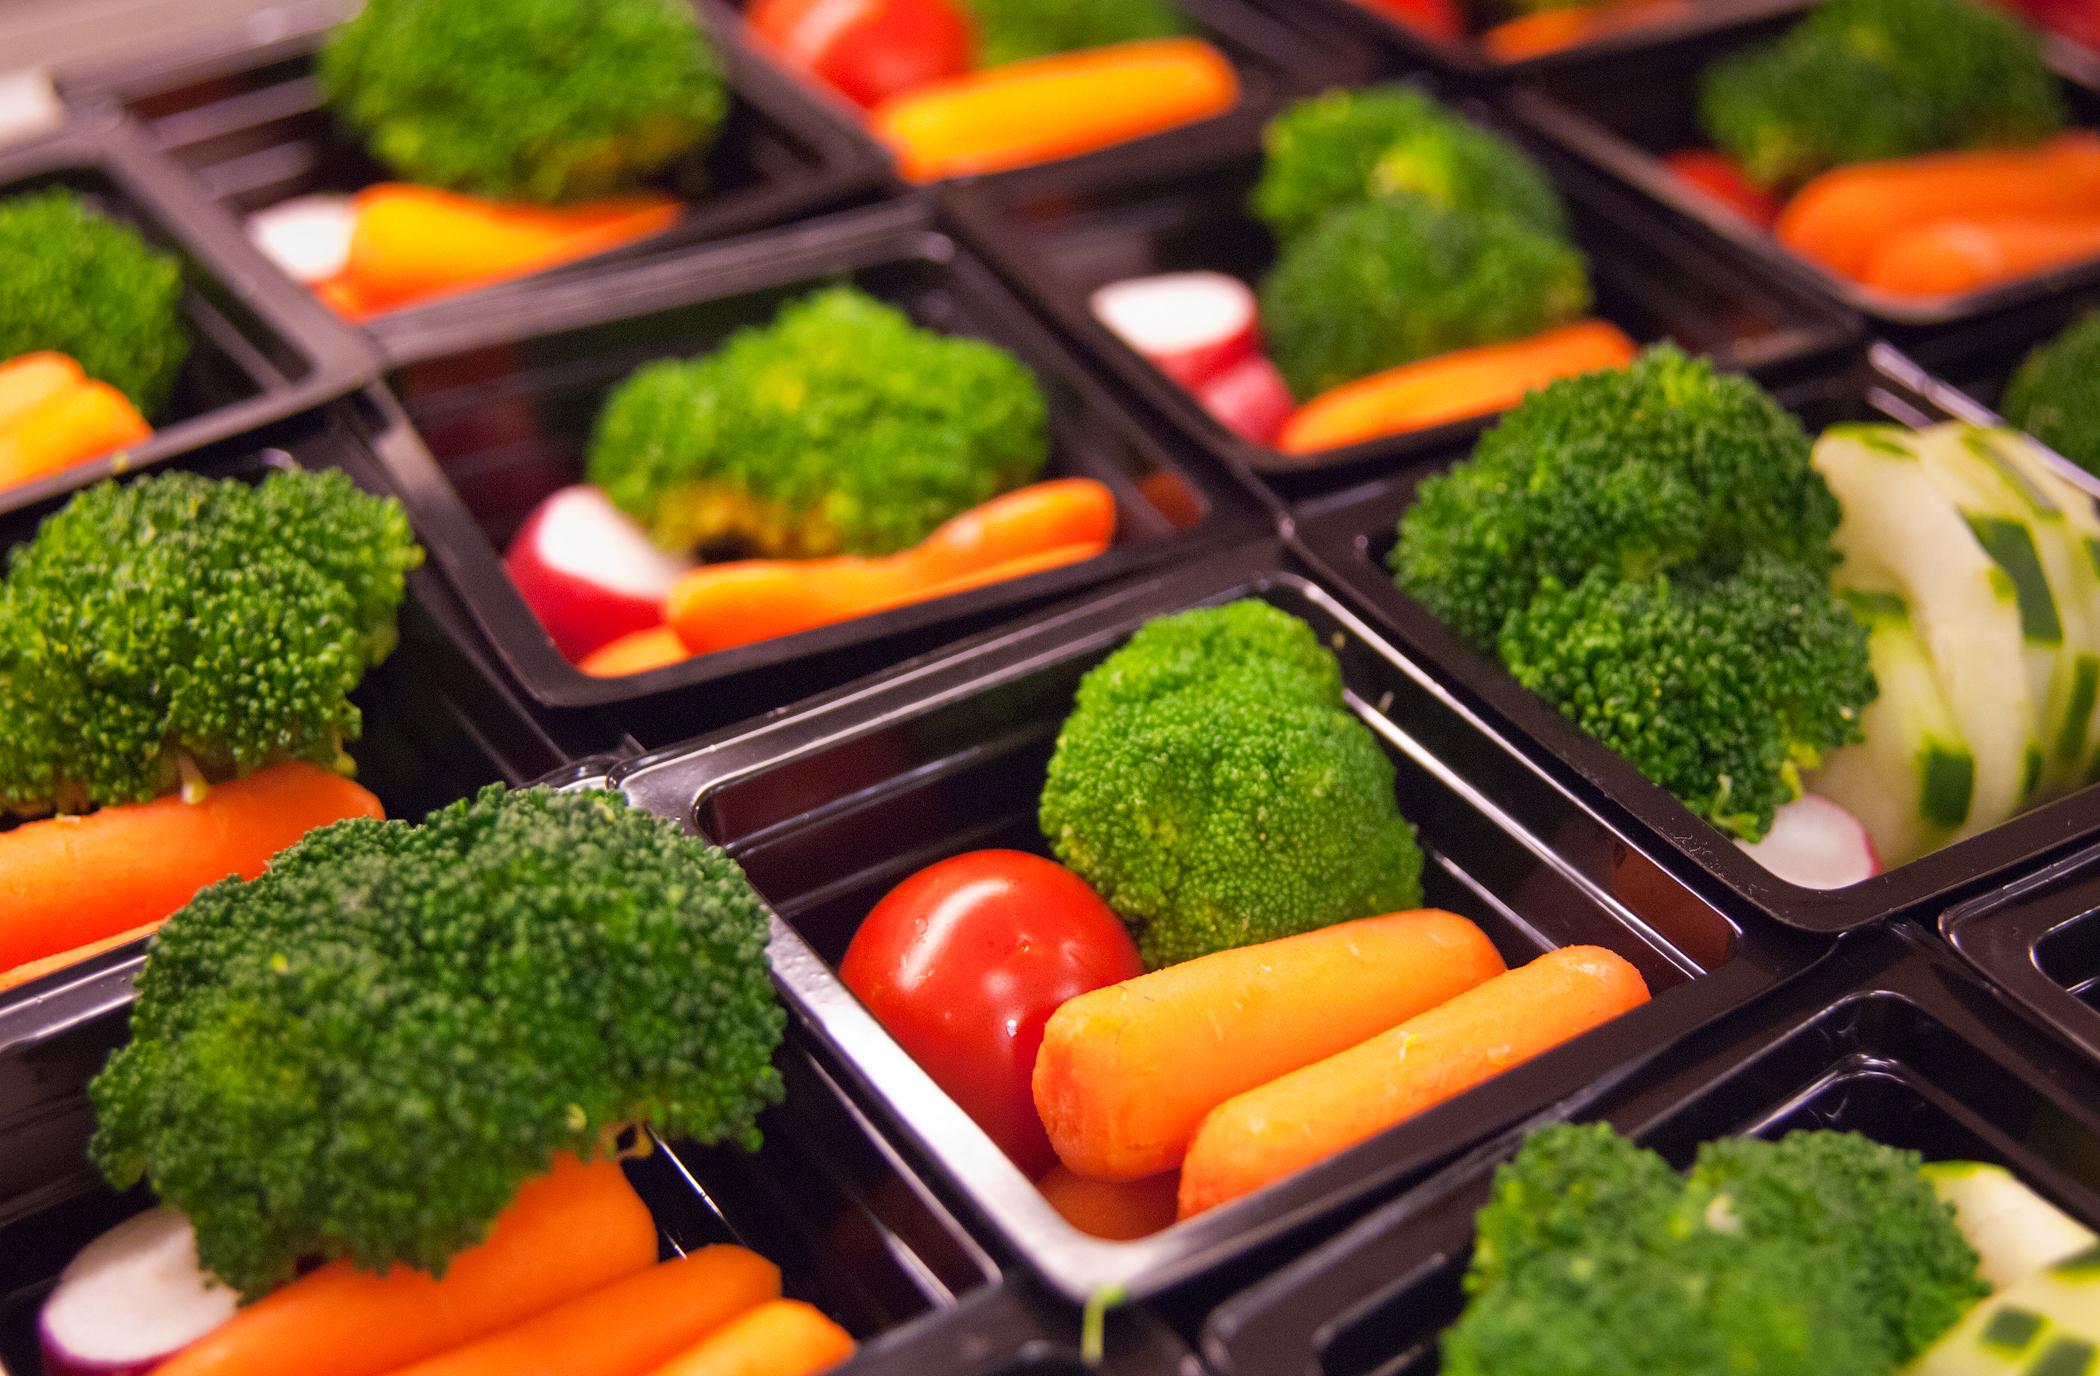 Fresh vegetable cups prepared for the National School Lunch Program at Washington-Lee High School in Arlington, Va. Bob Nichols/Flickr/USDA